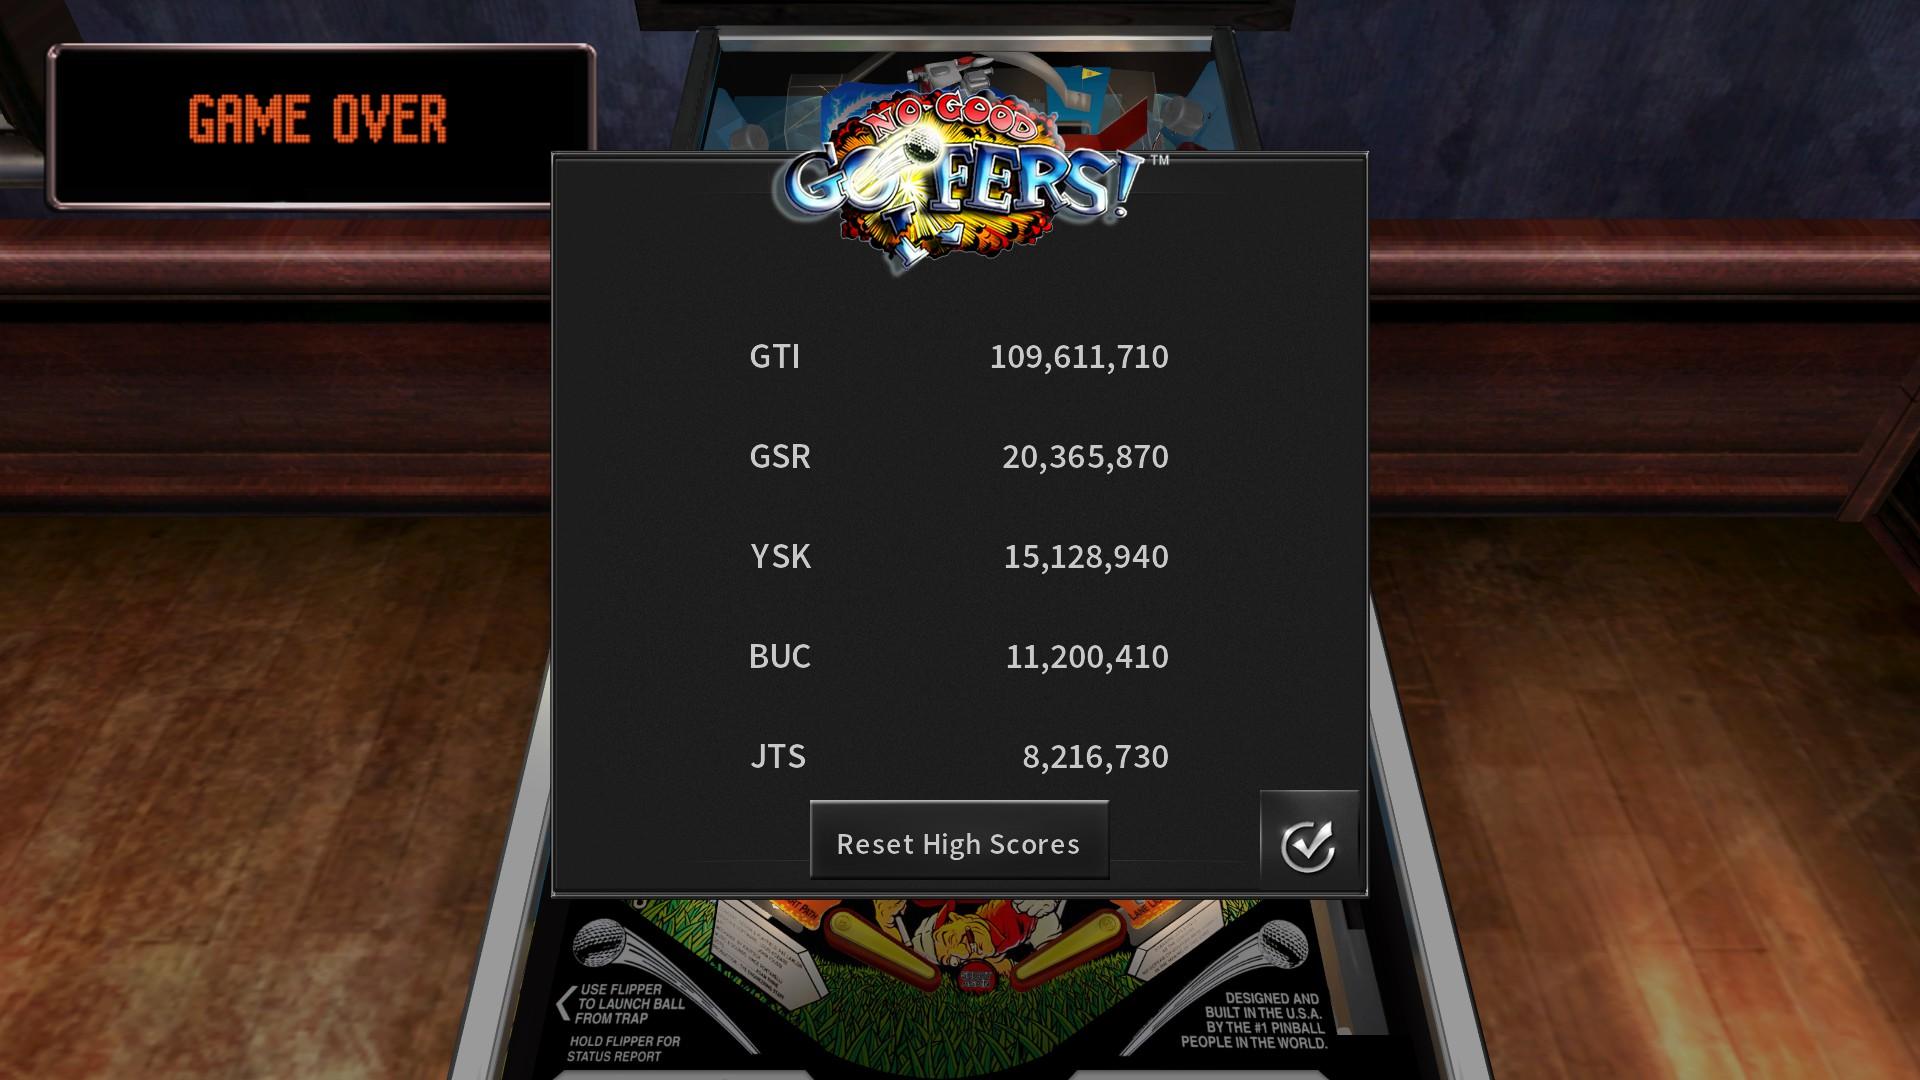 GTibel: Pinball Arcade: No Good Goofers (PC) 109,611,710 points on 2020-07-24 07:08:32